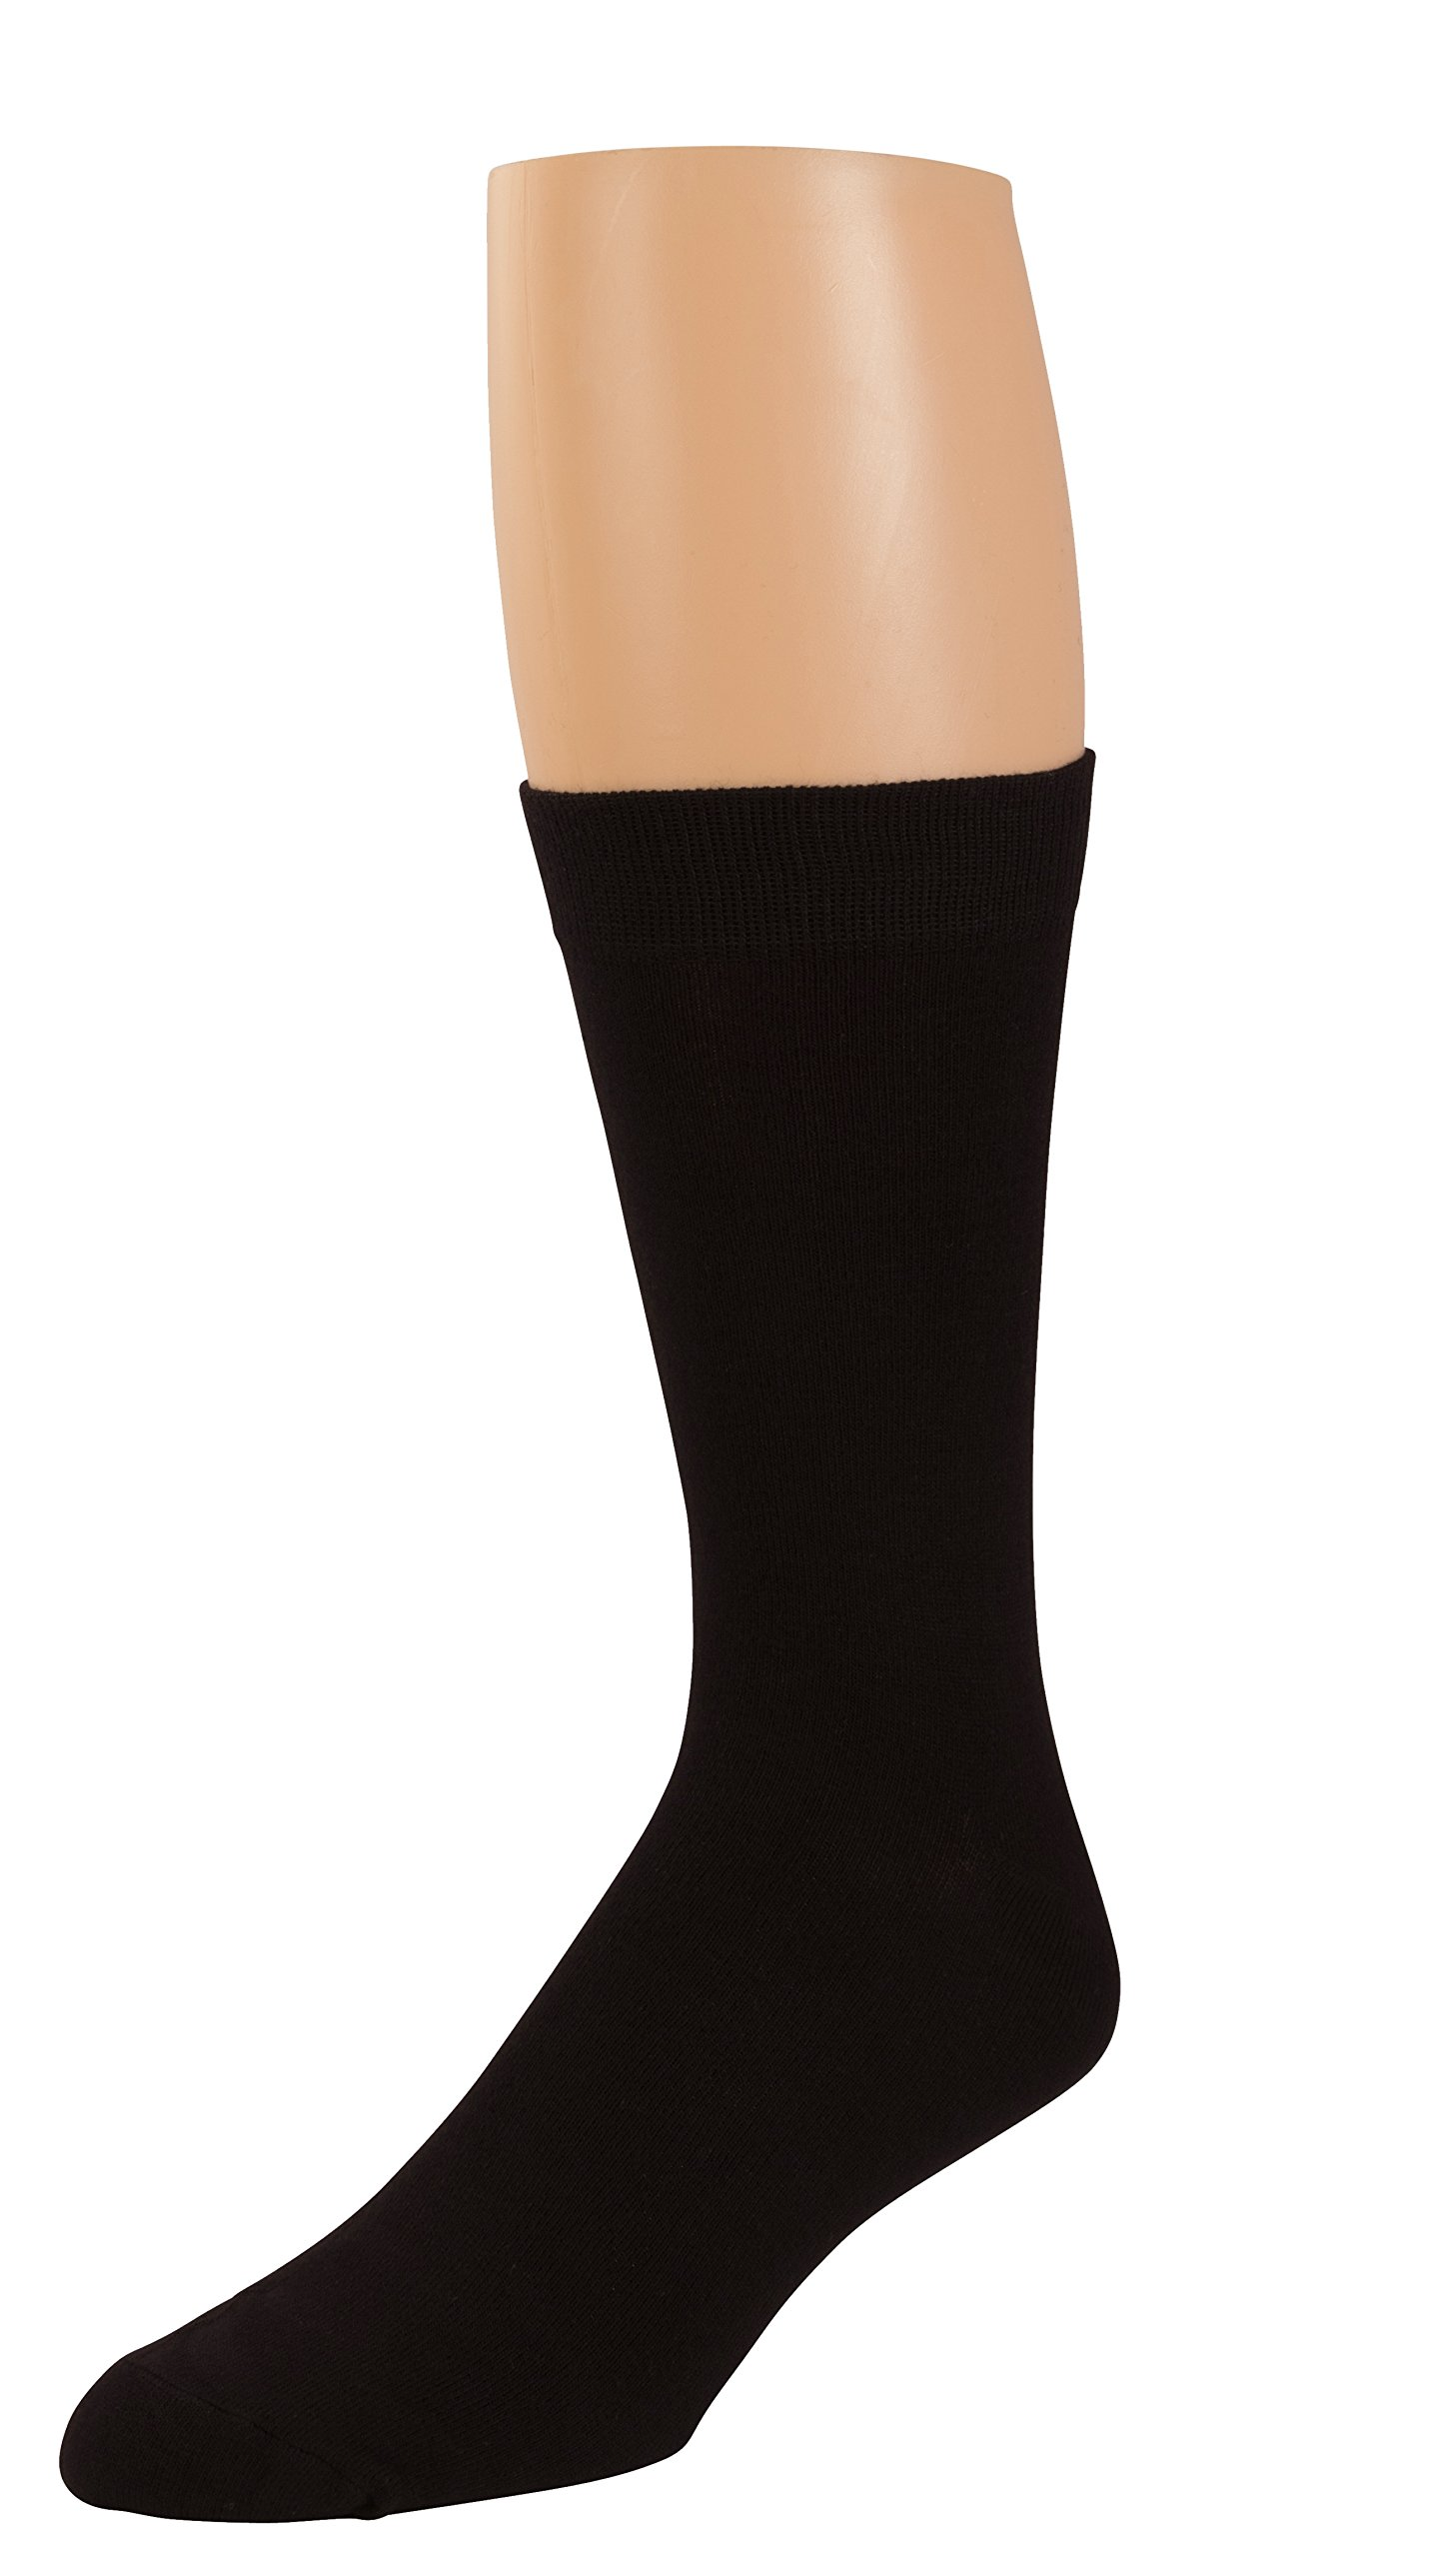 Non Sweat Men's Black Crew Socks - Ultra Soft Viscose Bamboo - 6 Pack - by Zeke by ZEKE (Image #2)